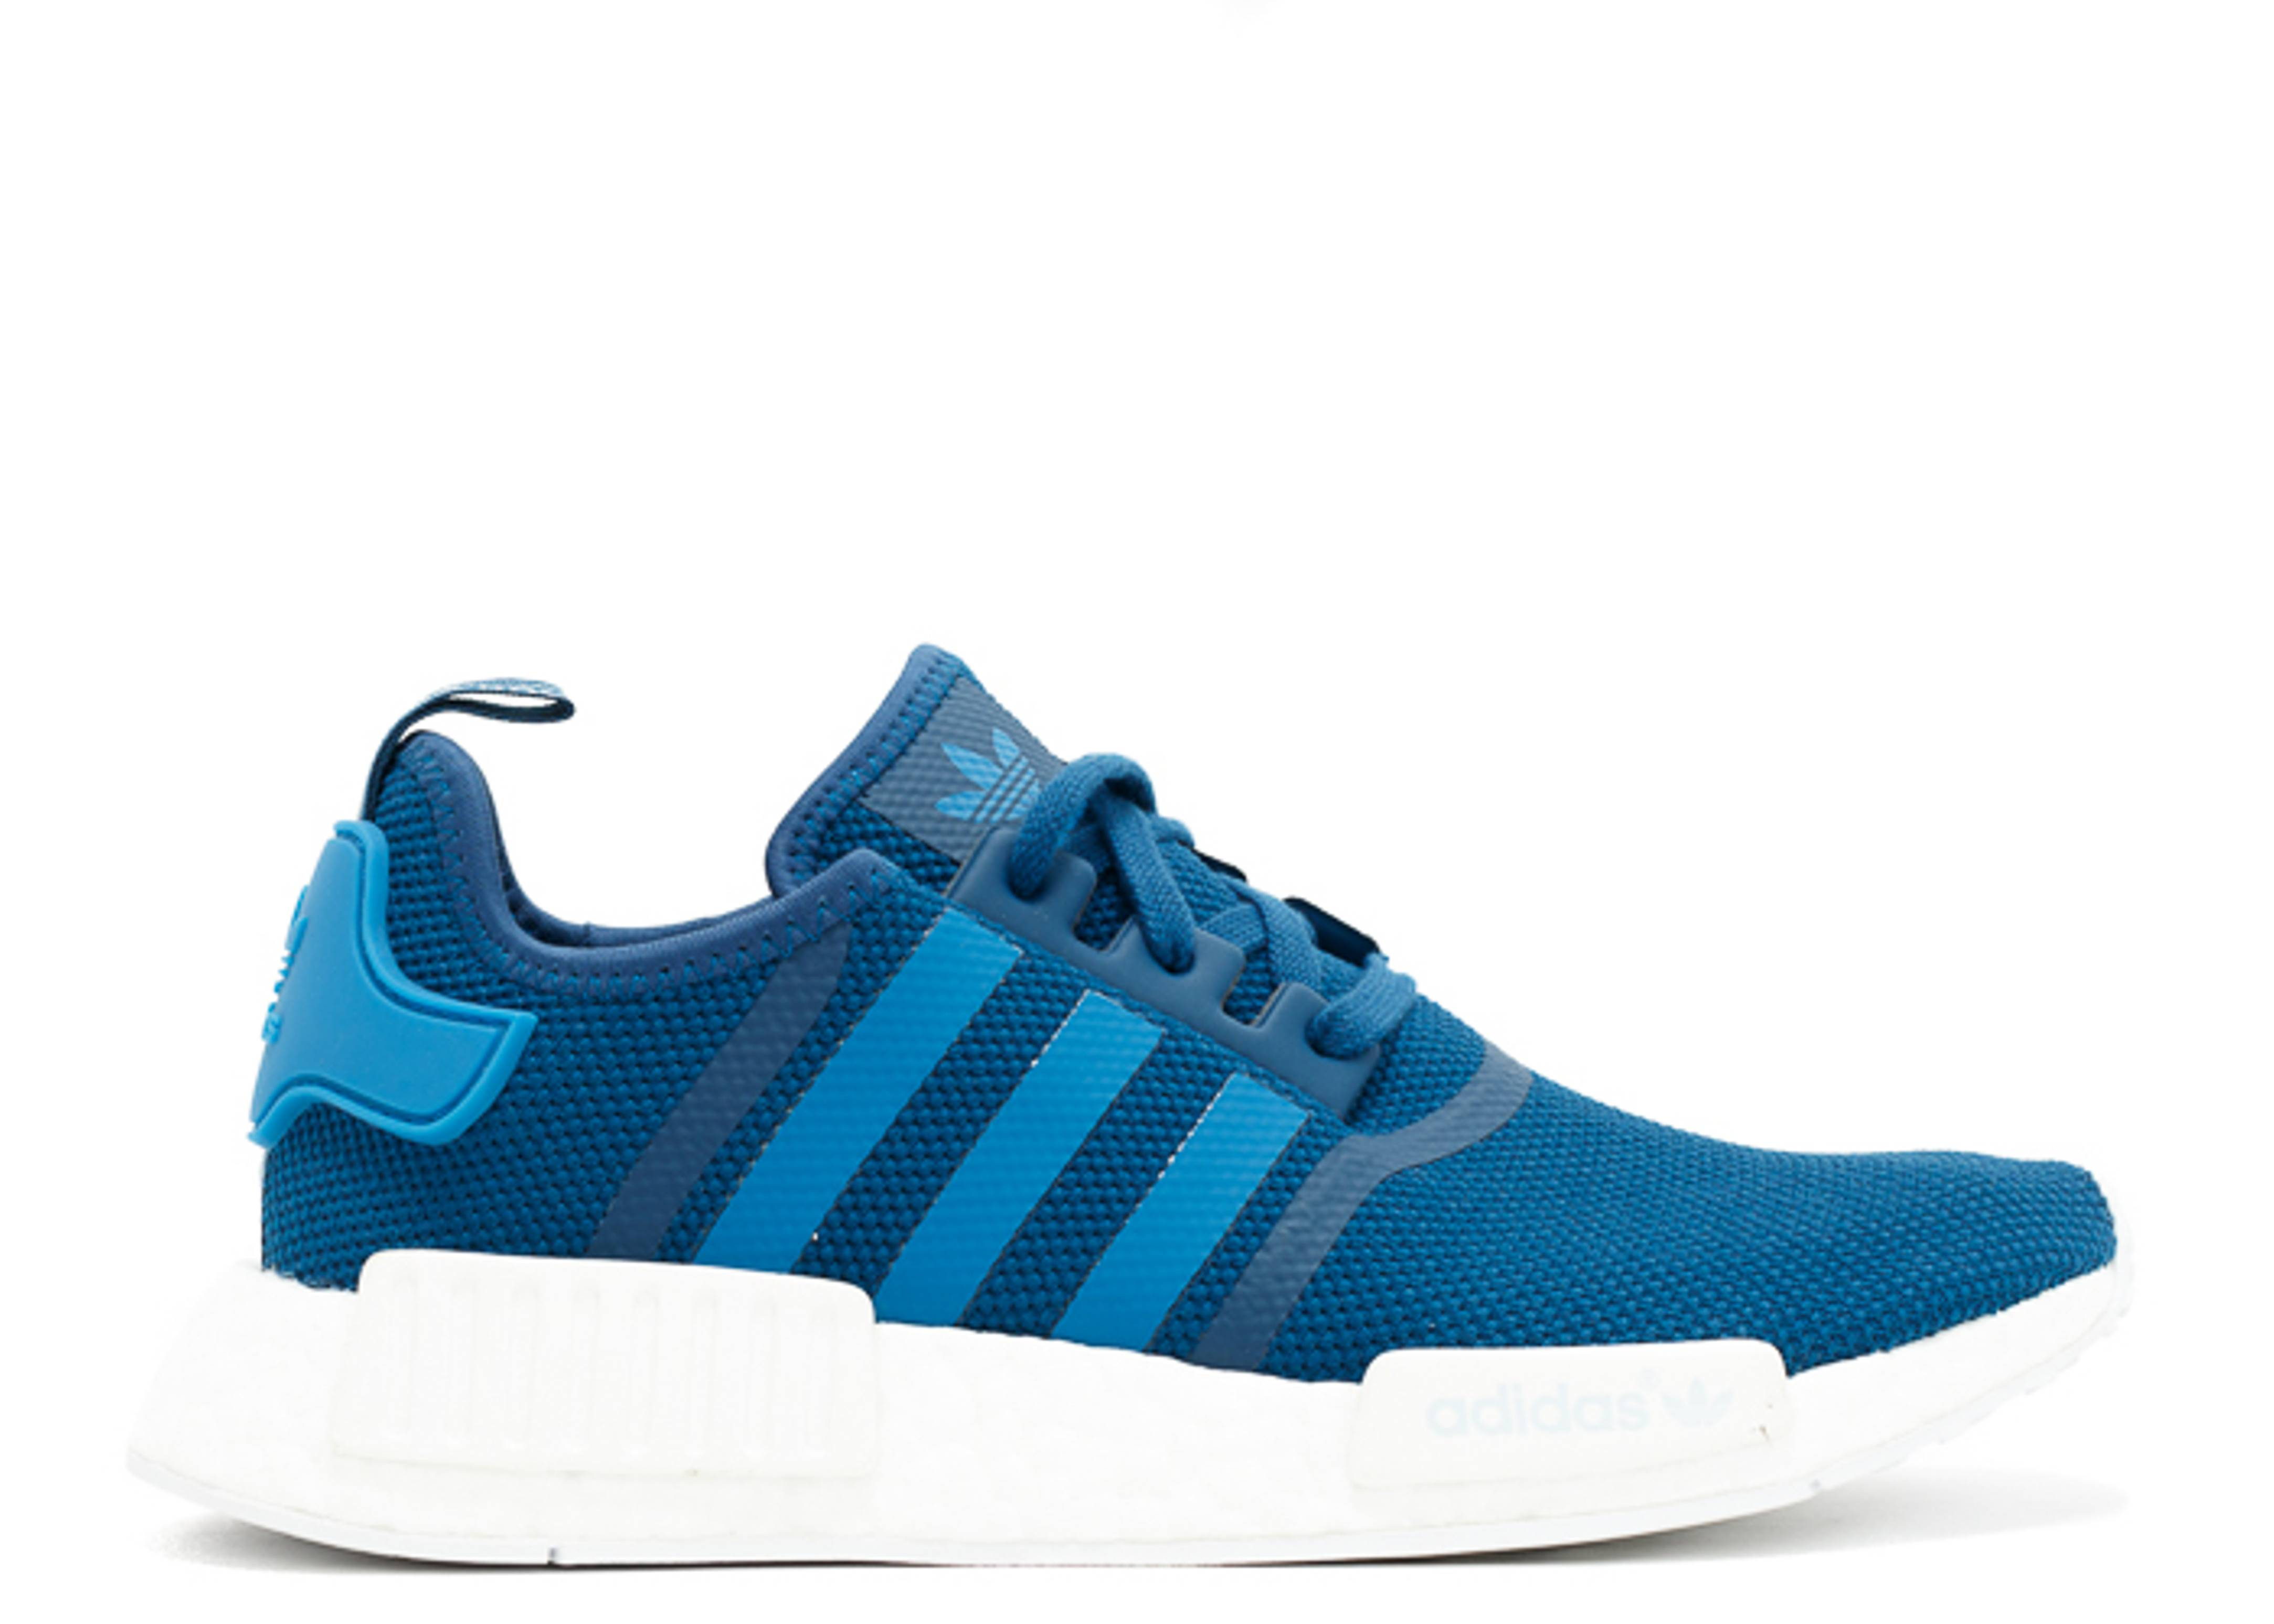 Nmd Blue White